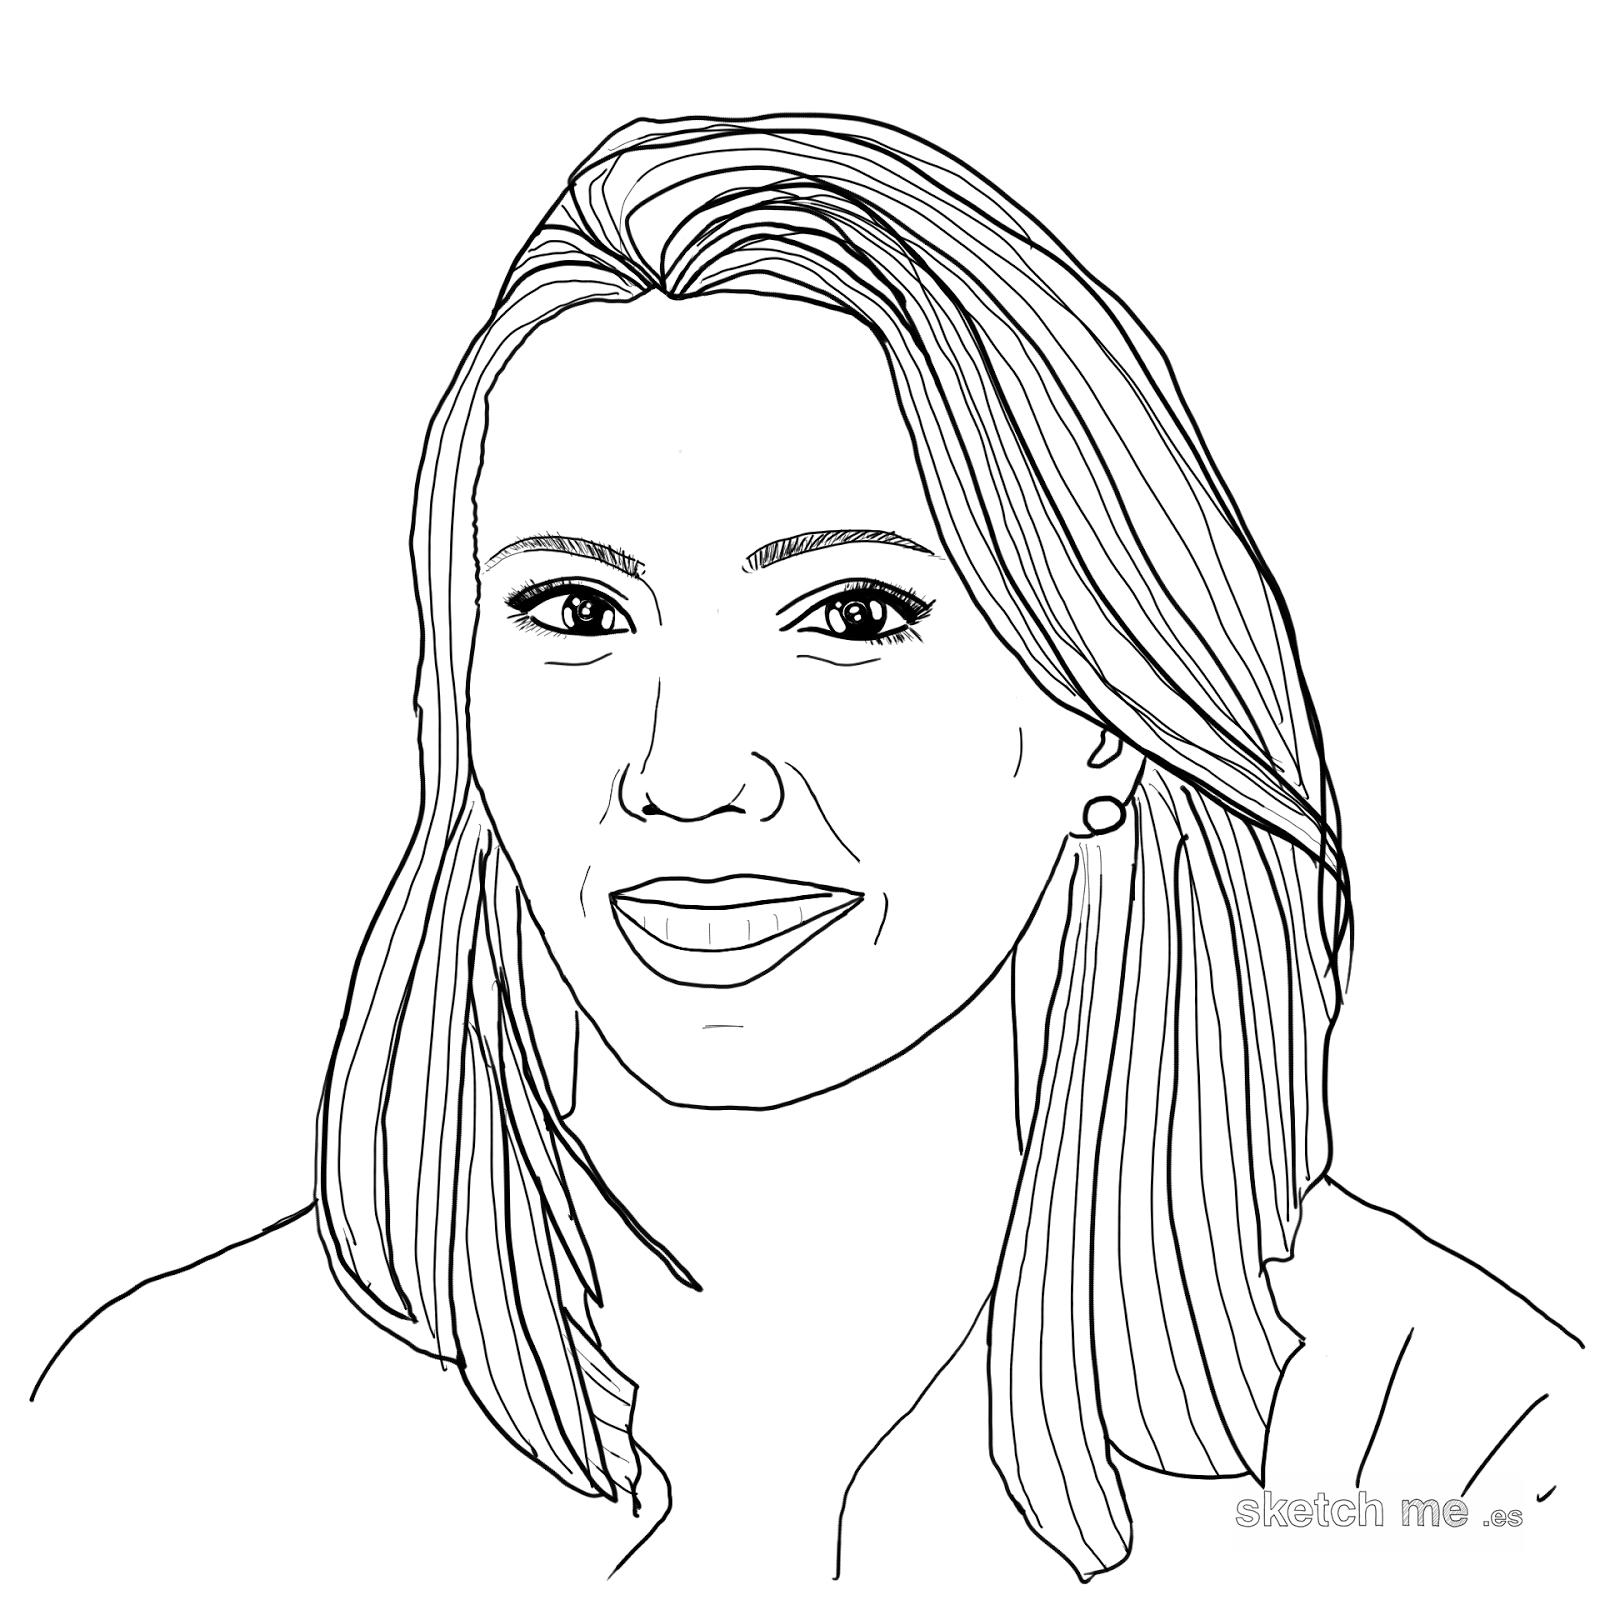 ana-pastor-sketch-me-retratos-personalizados-dibujados-a-mano-para-facebook-twitter-whatsapp